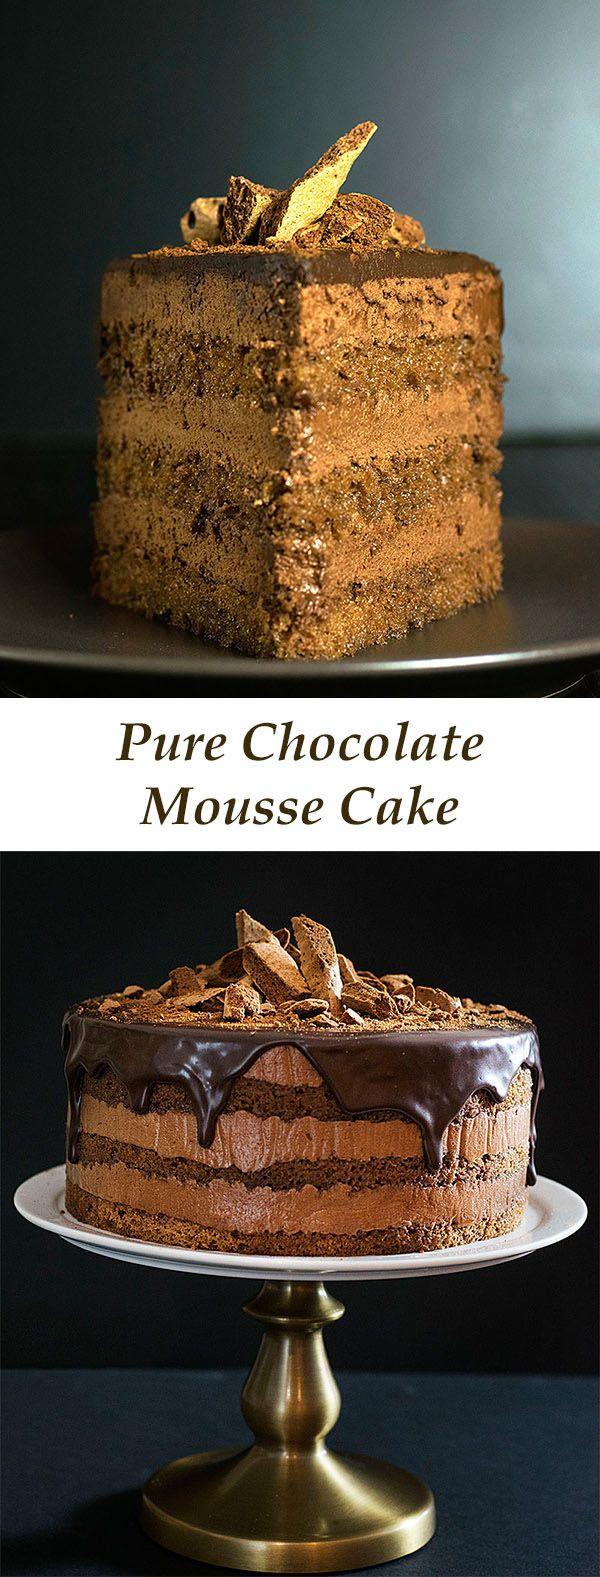 pure chocolate mousse cake | thehungrybites.com